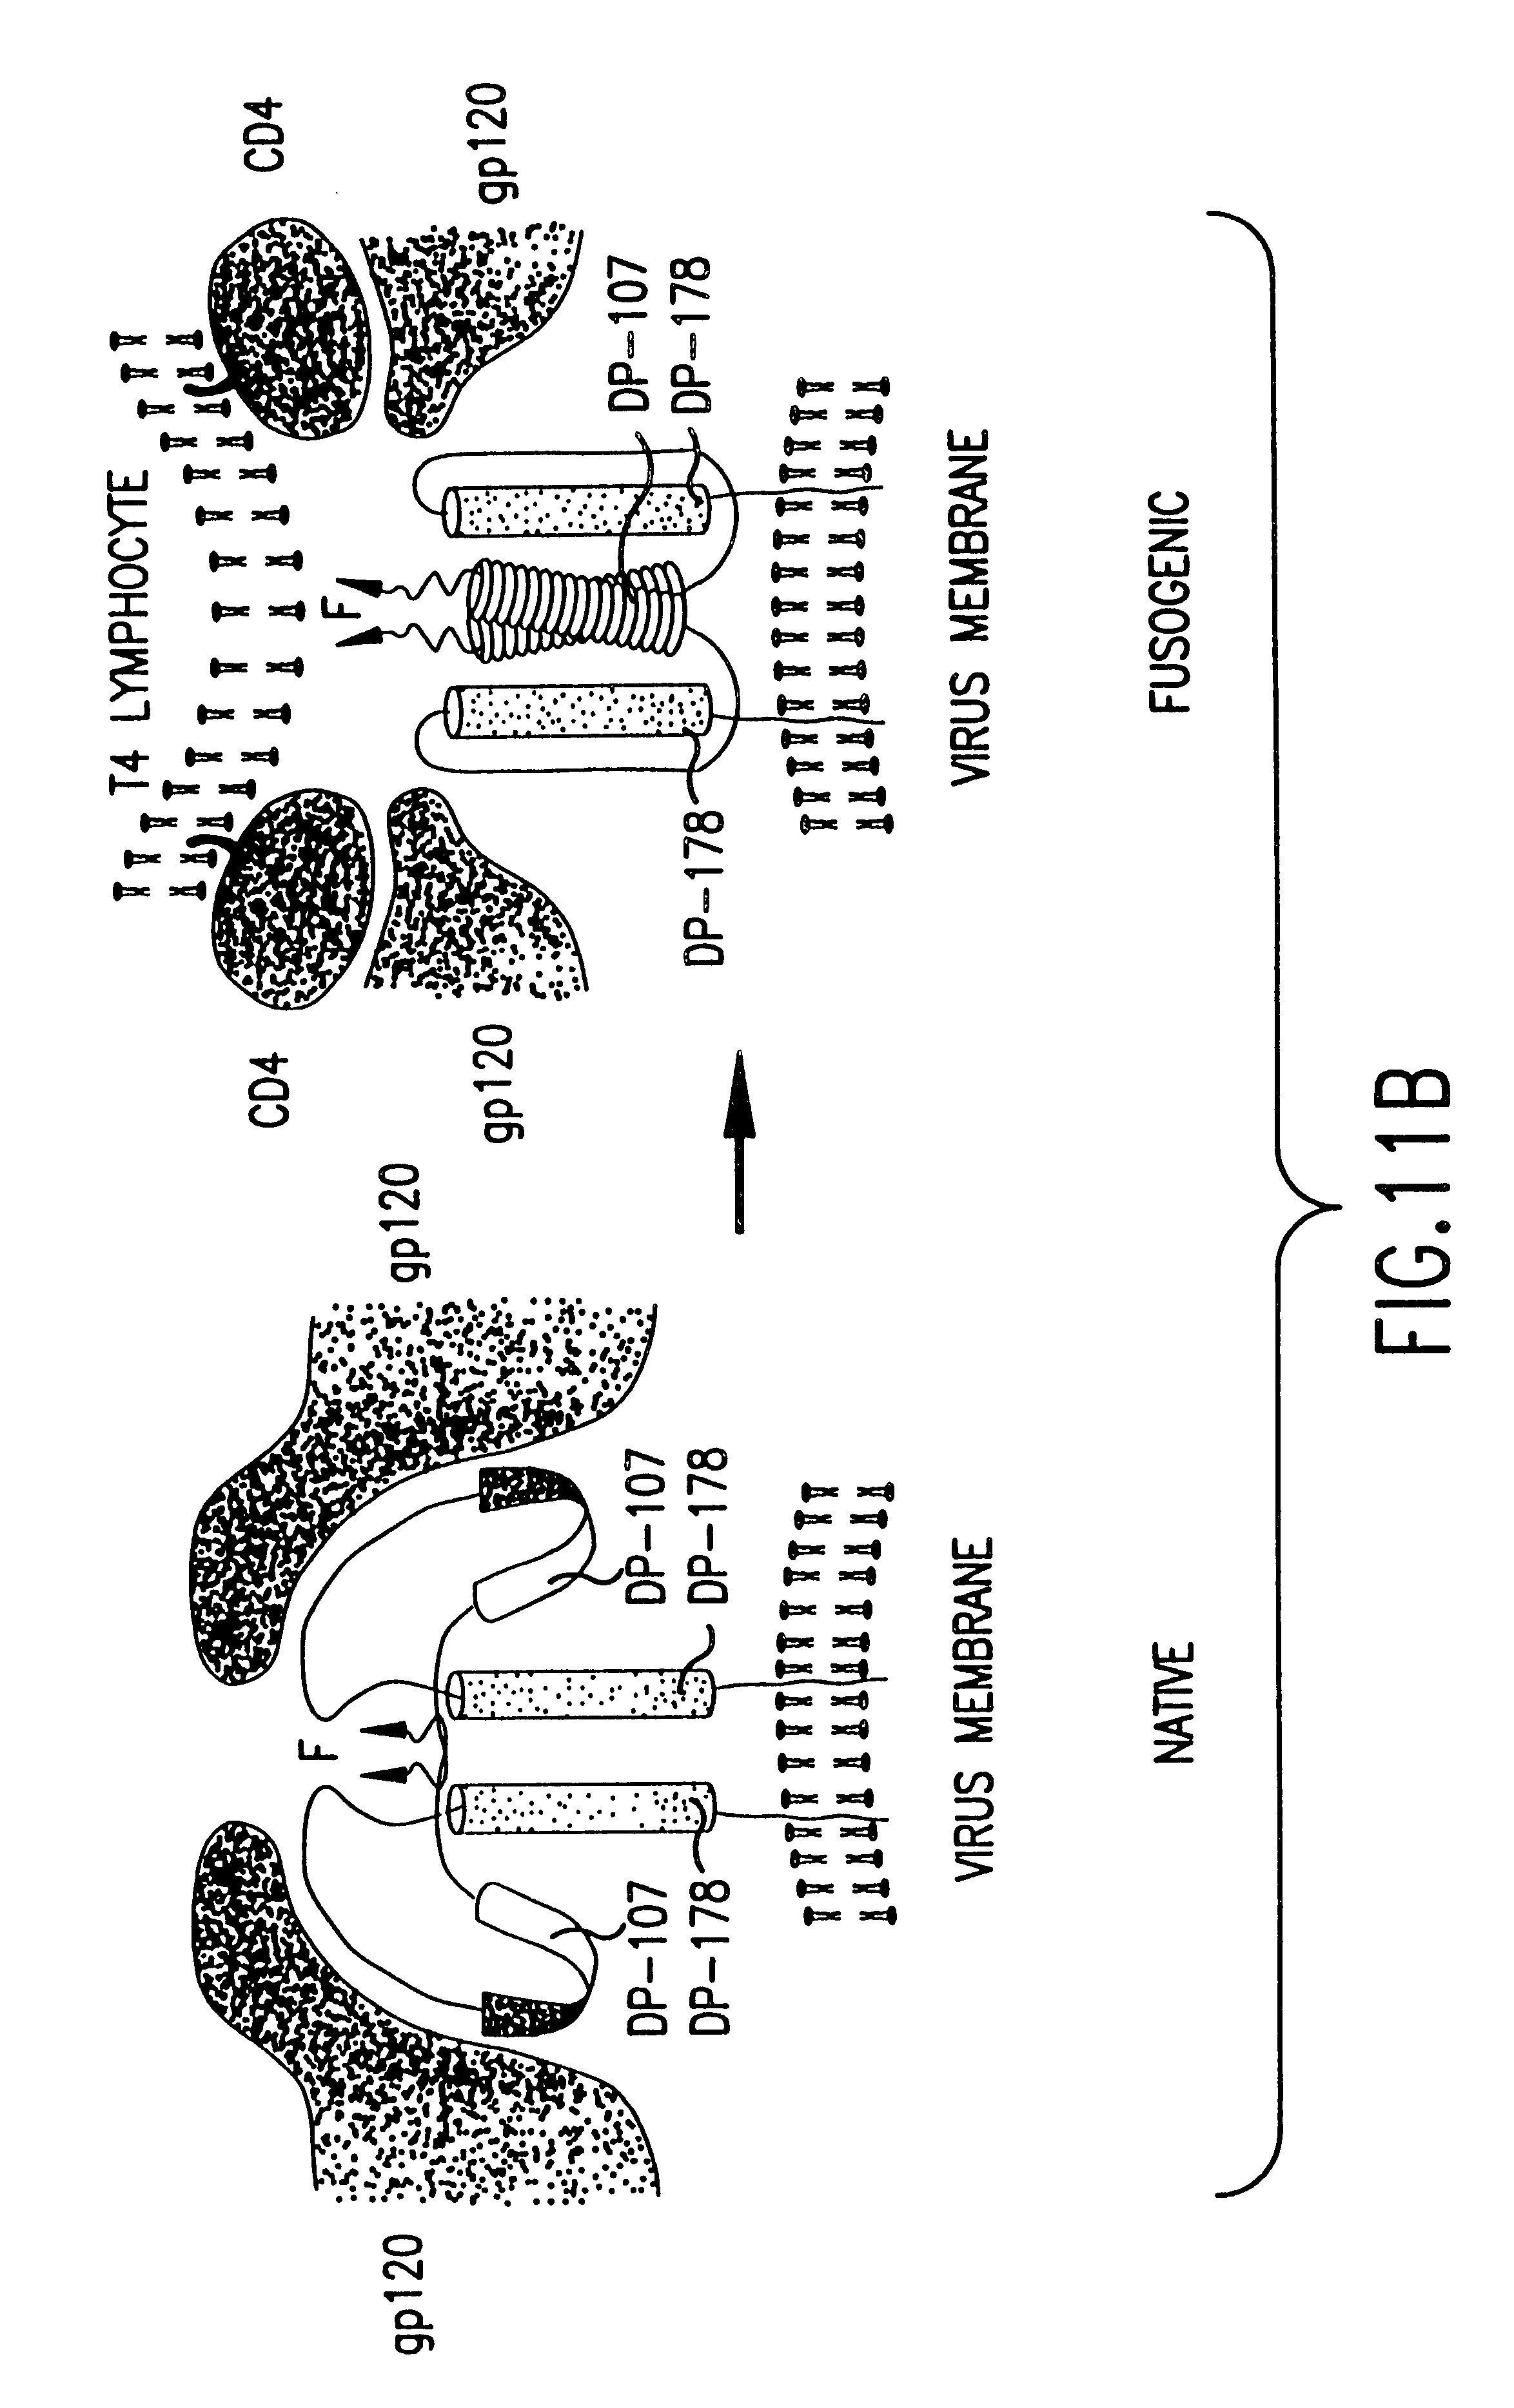 Patent Us 6228983 B1 1989 Volkswagen Fox 18 Fuse Box Diagram Images